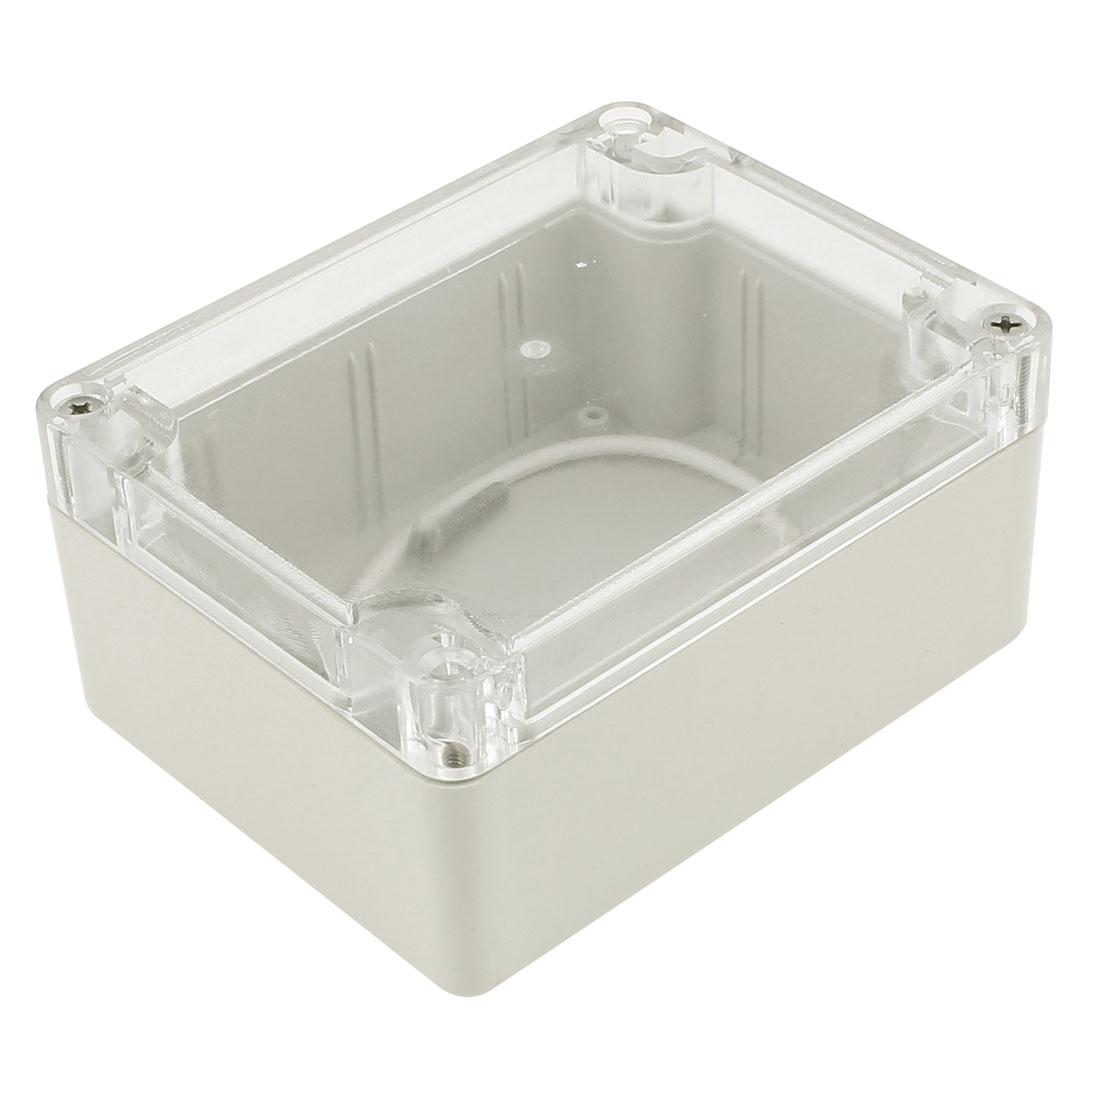 115 x 90 x 55mm Dustproof IP65 Junction Box DIY Terminal Connect Enclosure Adaptable